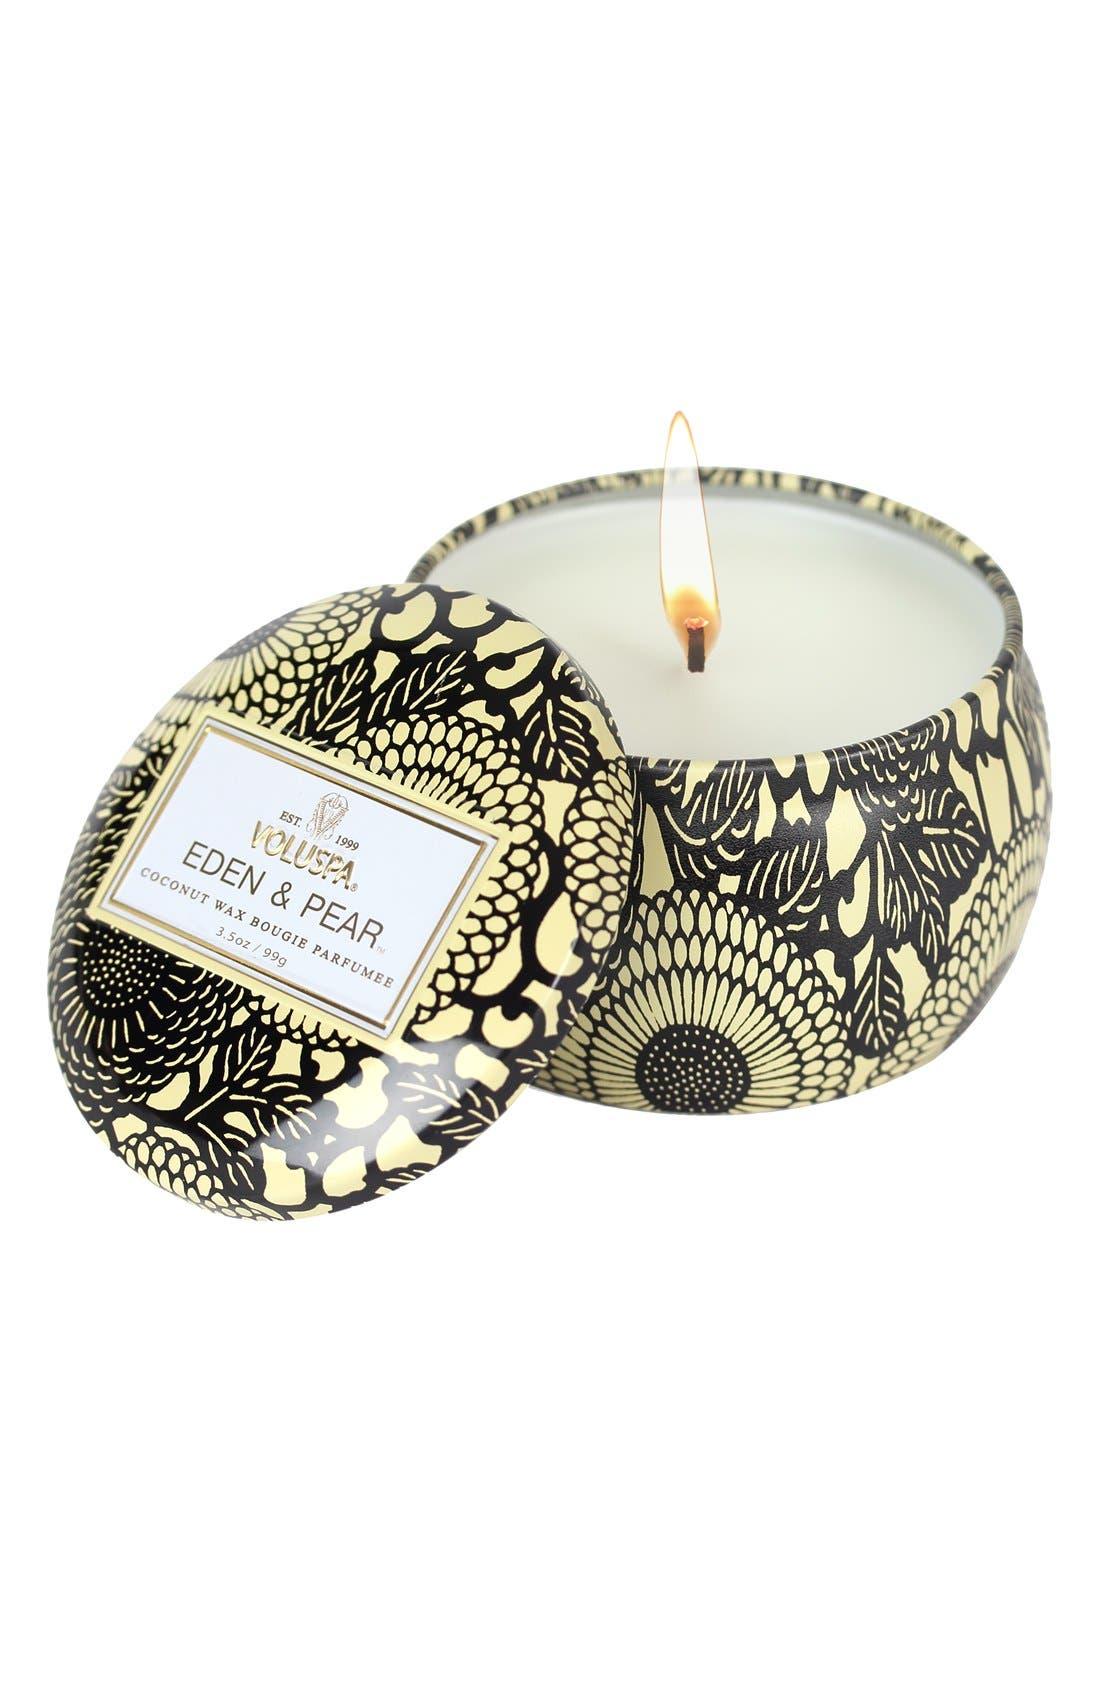 Main Image - Voluspa 'Japonica - Eden & Pear' Petite Decorative Candle